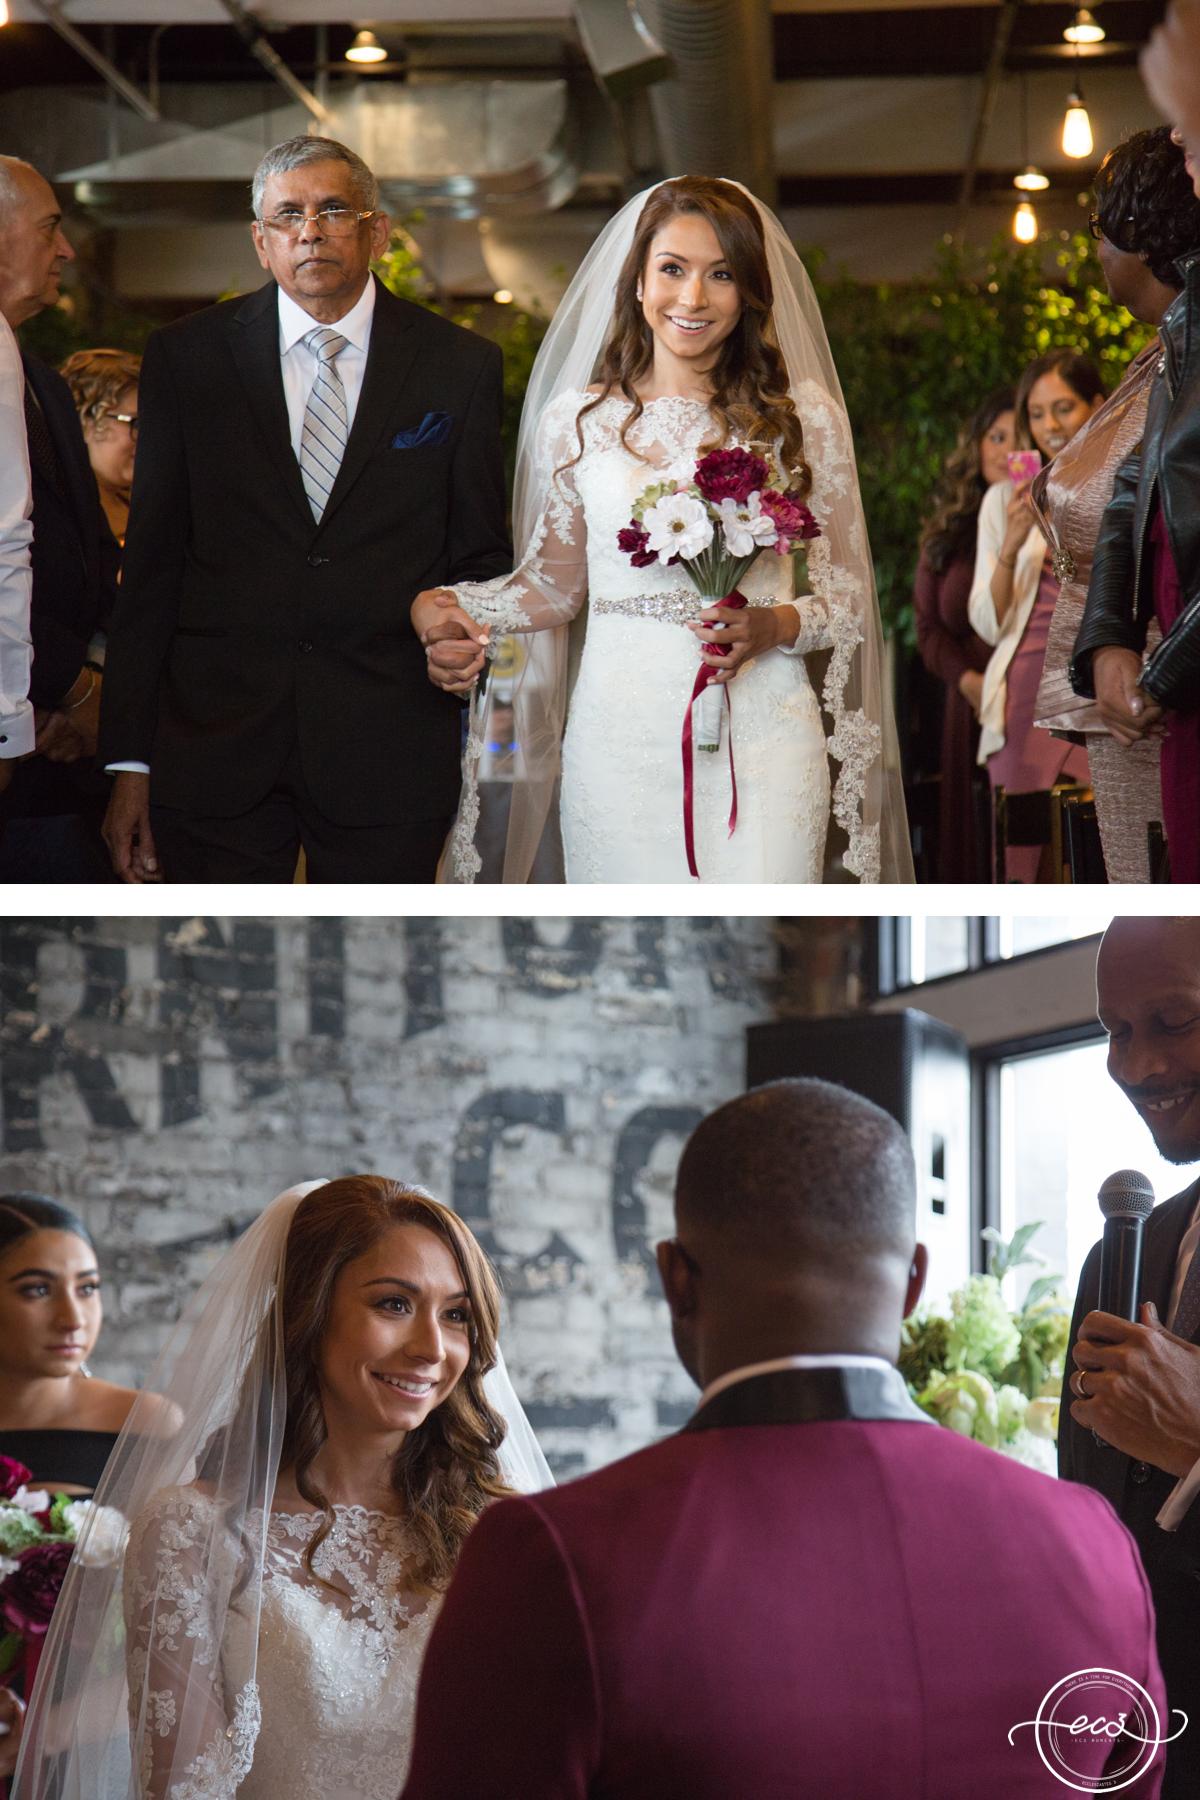 AA-Rustic-Toronto-Burroughes-Wedding21.jpg